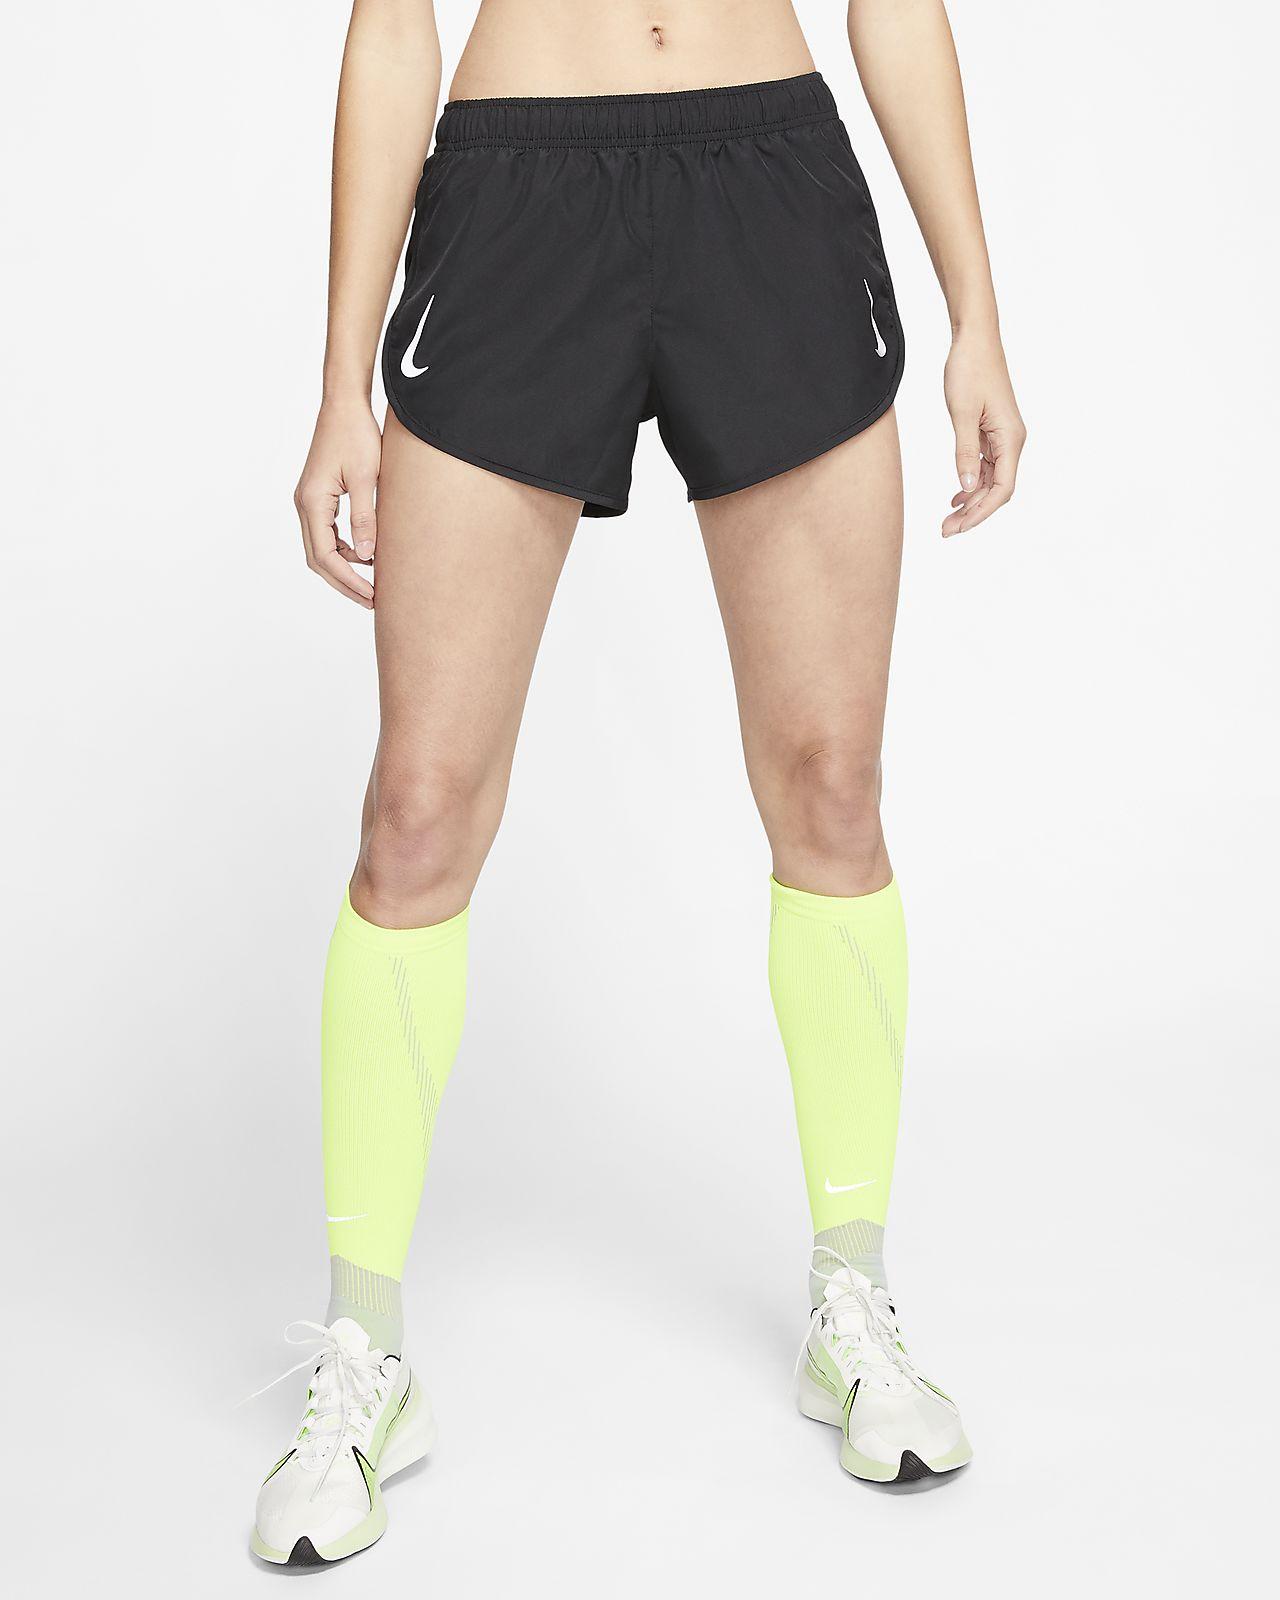 Short de running taille haute Nike Tempo pour Femme